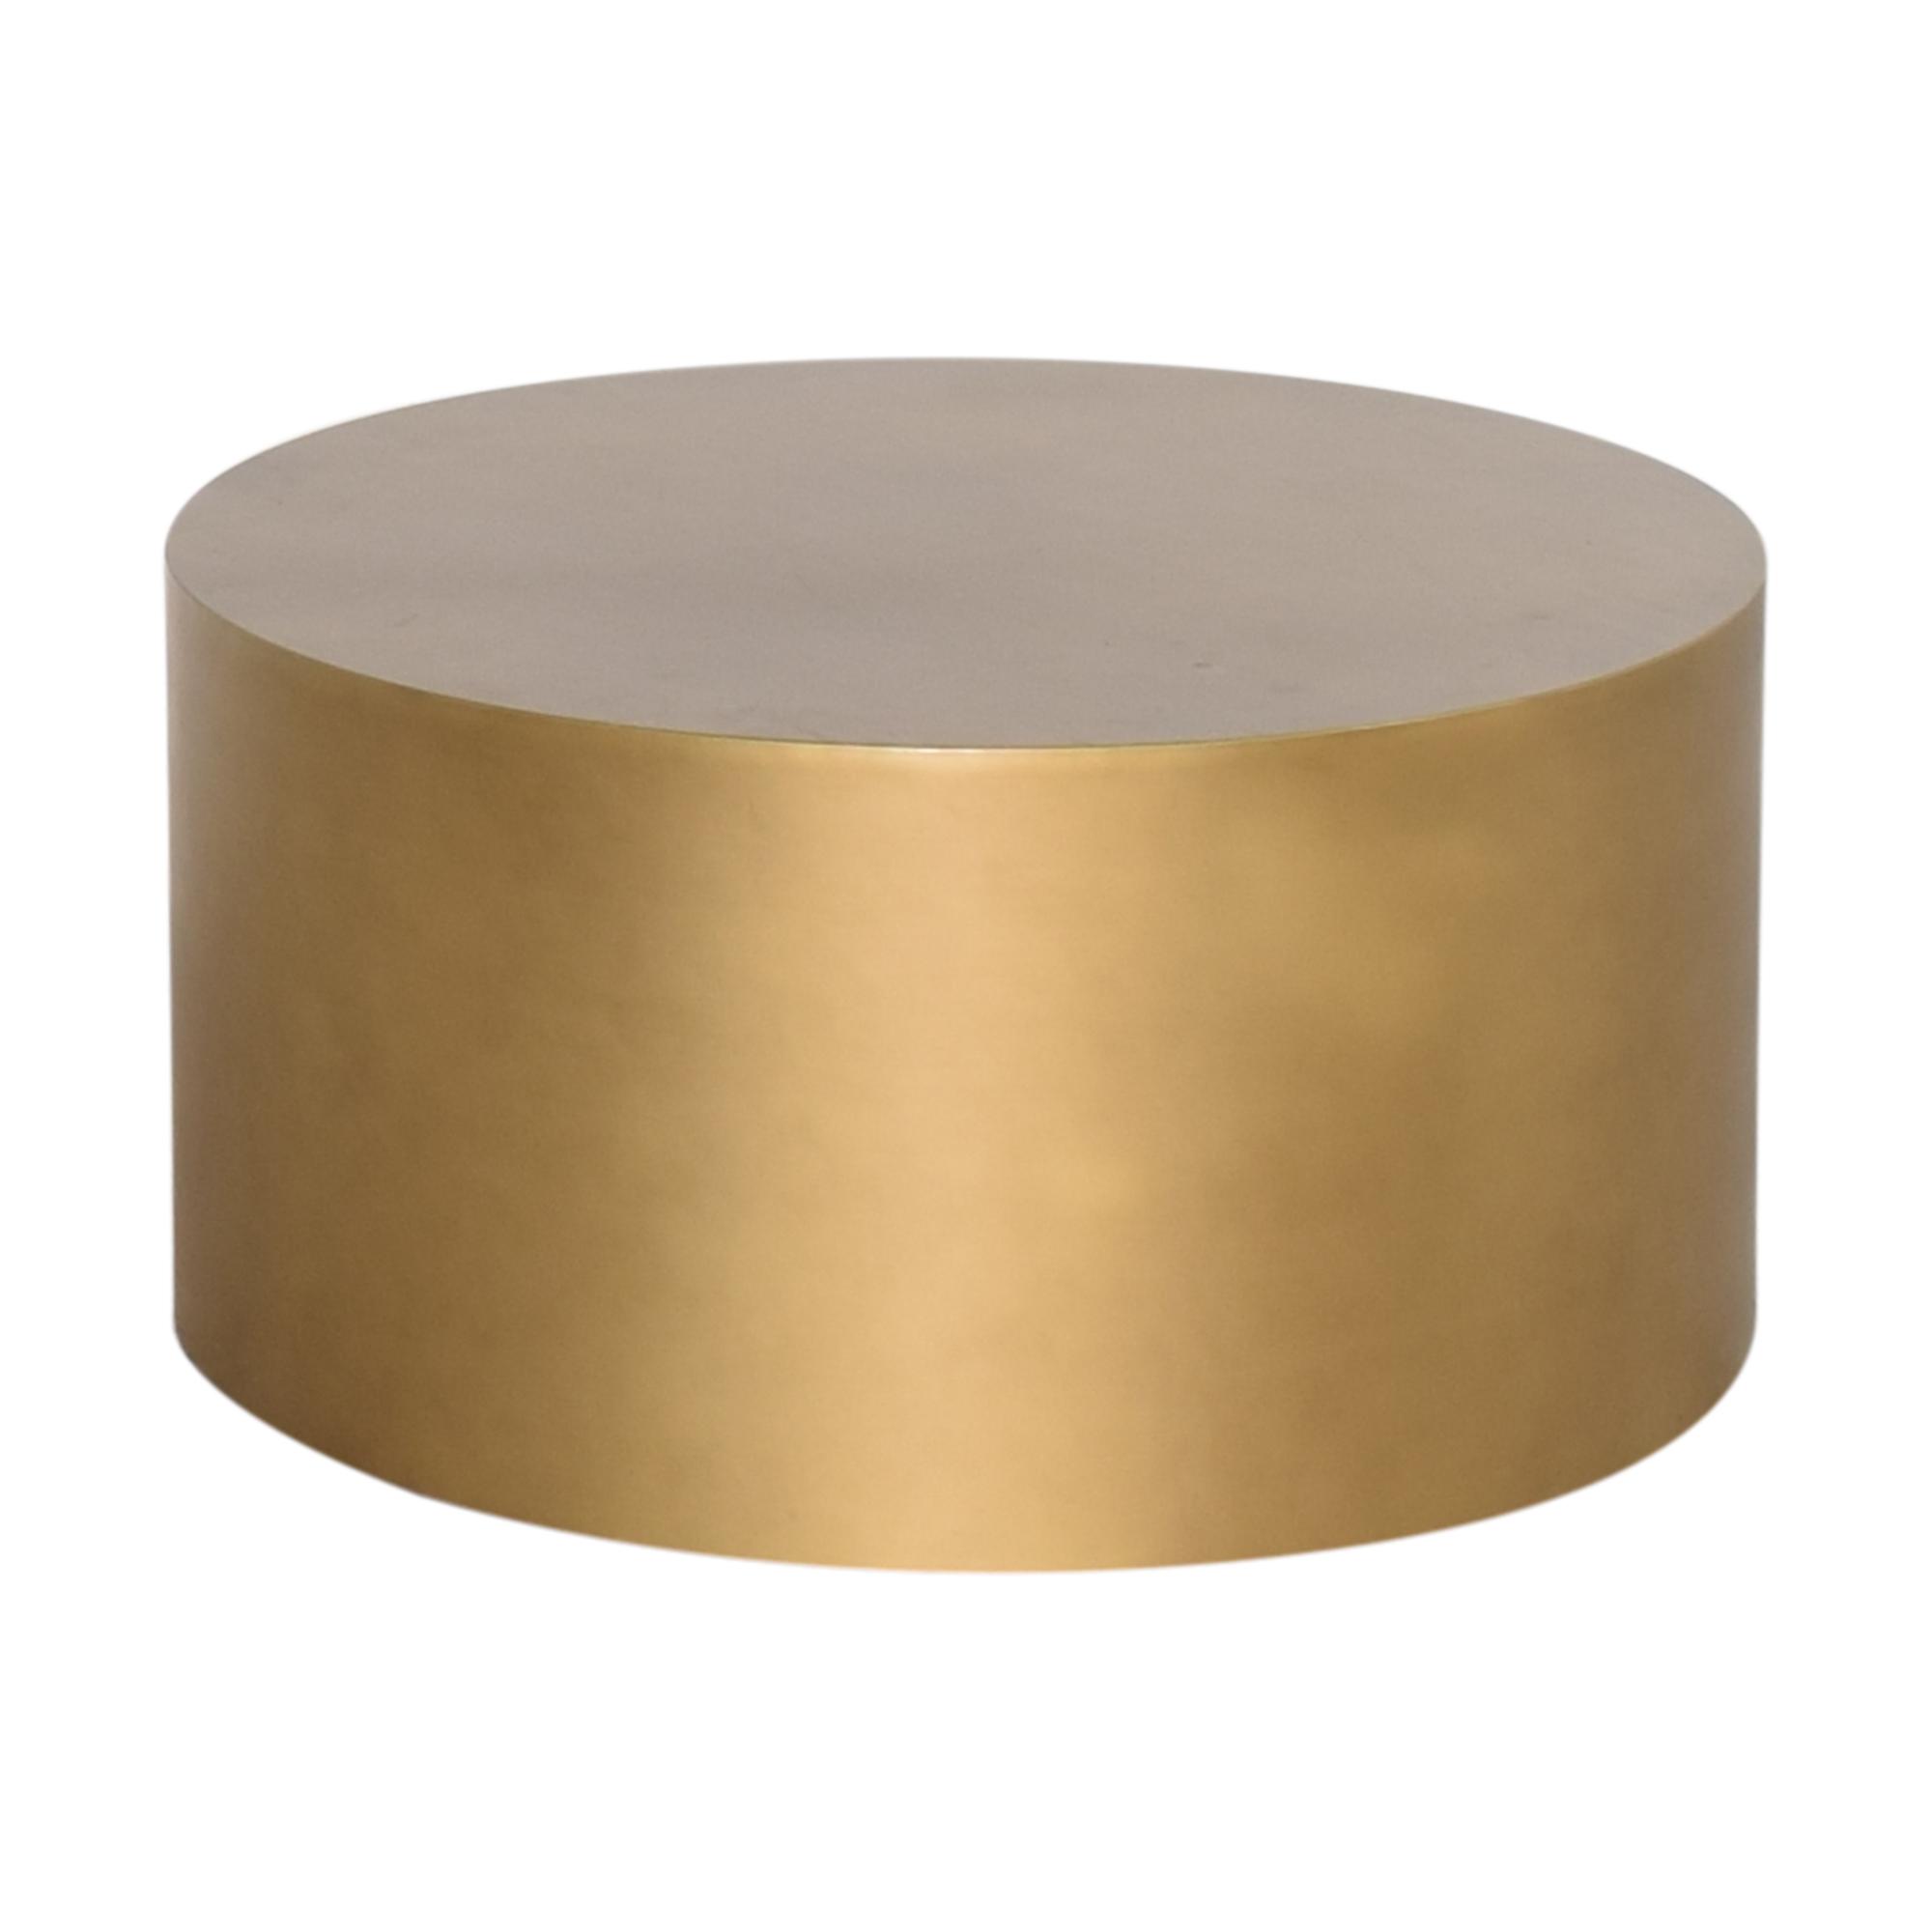 West Elm West Elm Drum Coffee Table gold